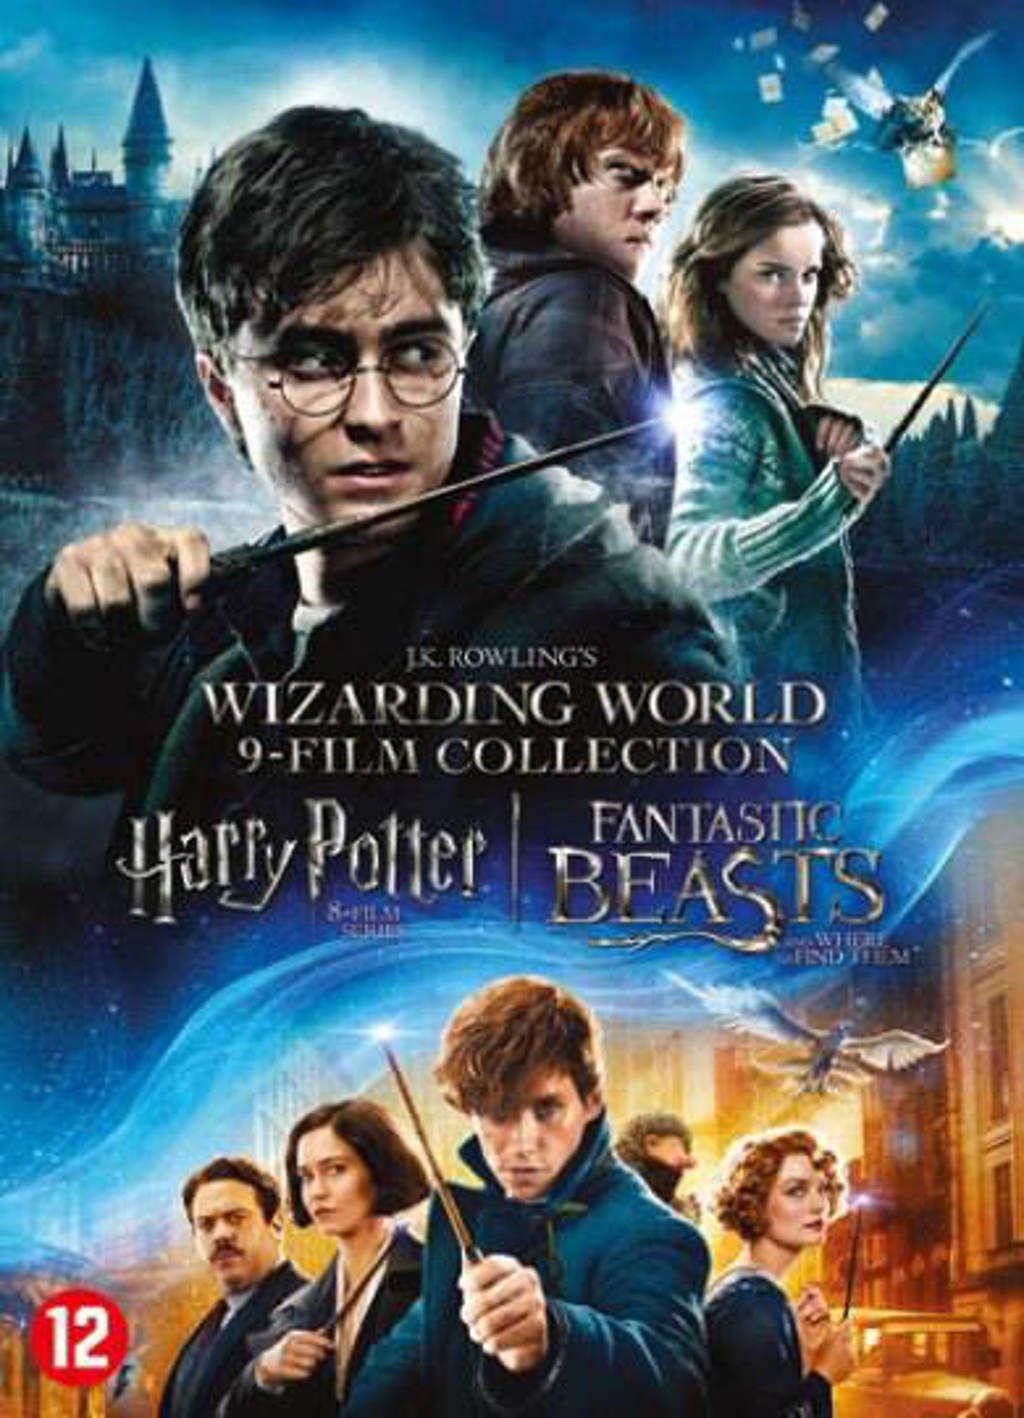 Harry Potter 1-8 + Fantastic beasts 1 (DVD)